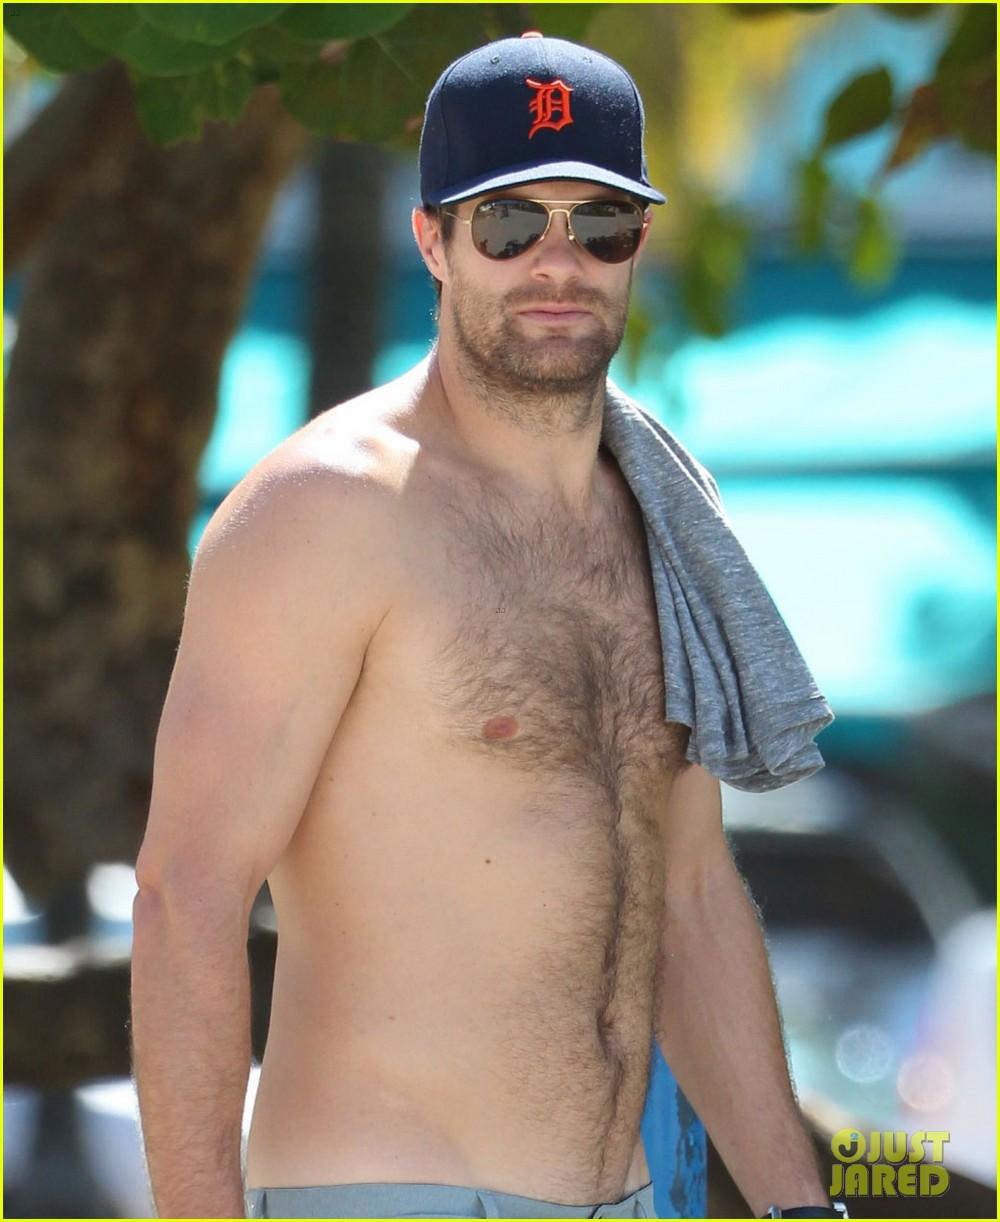 Willie parker shirtless